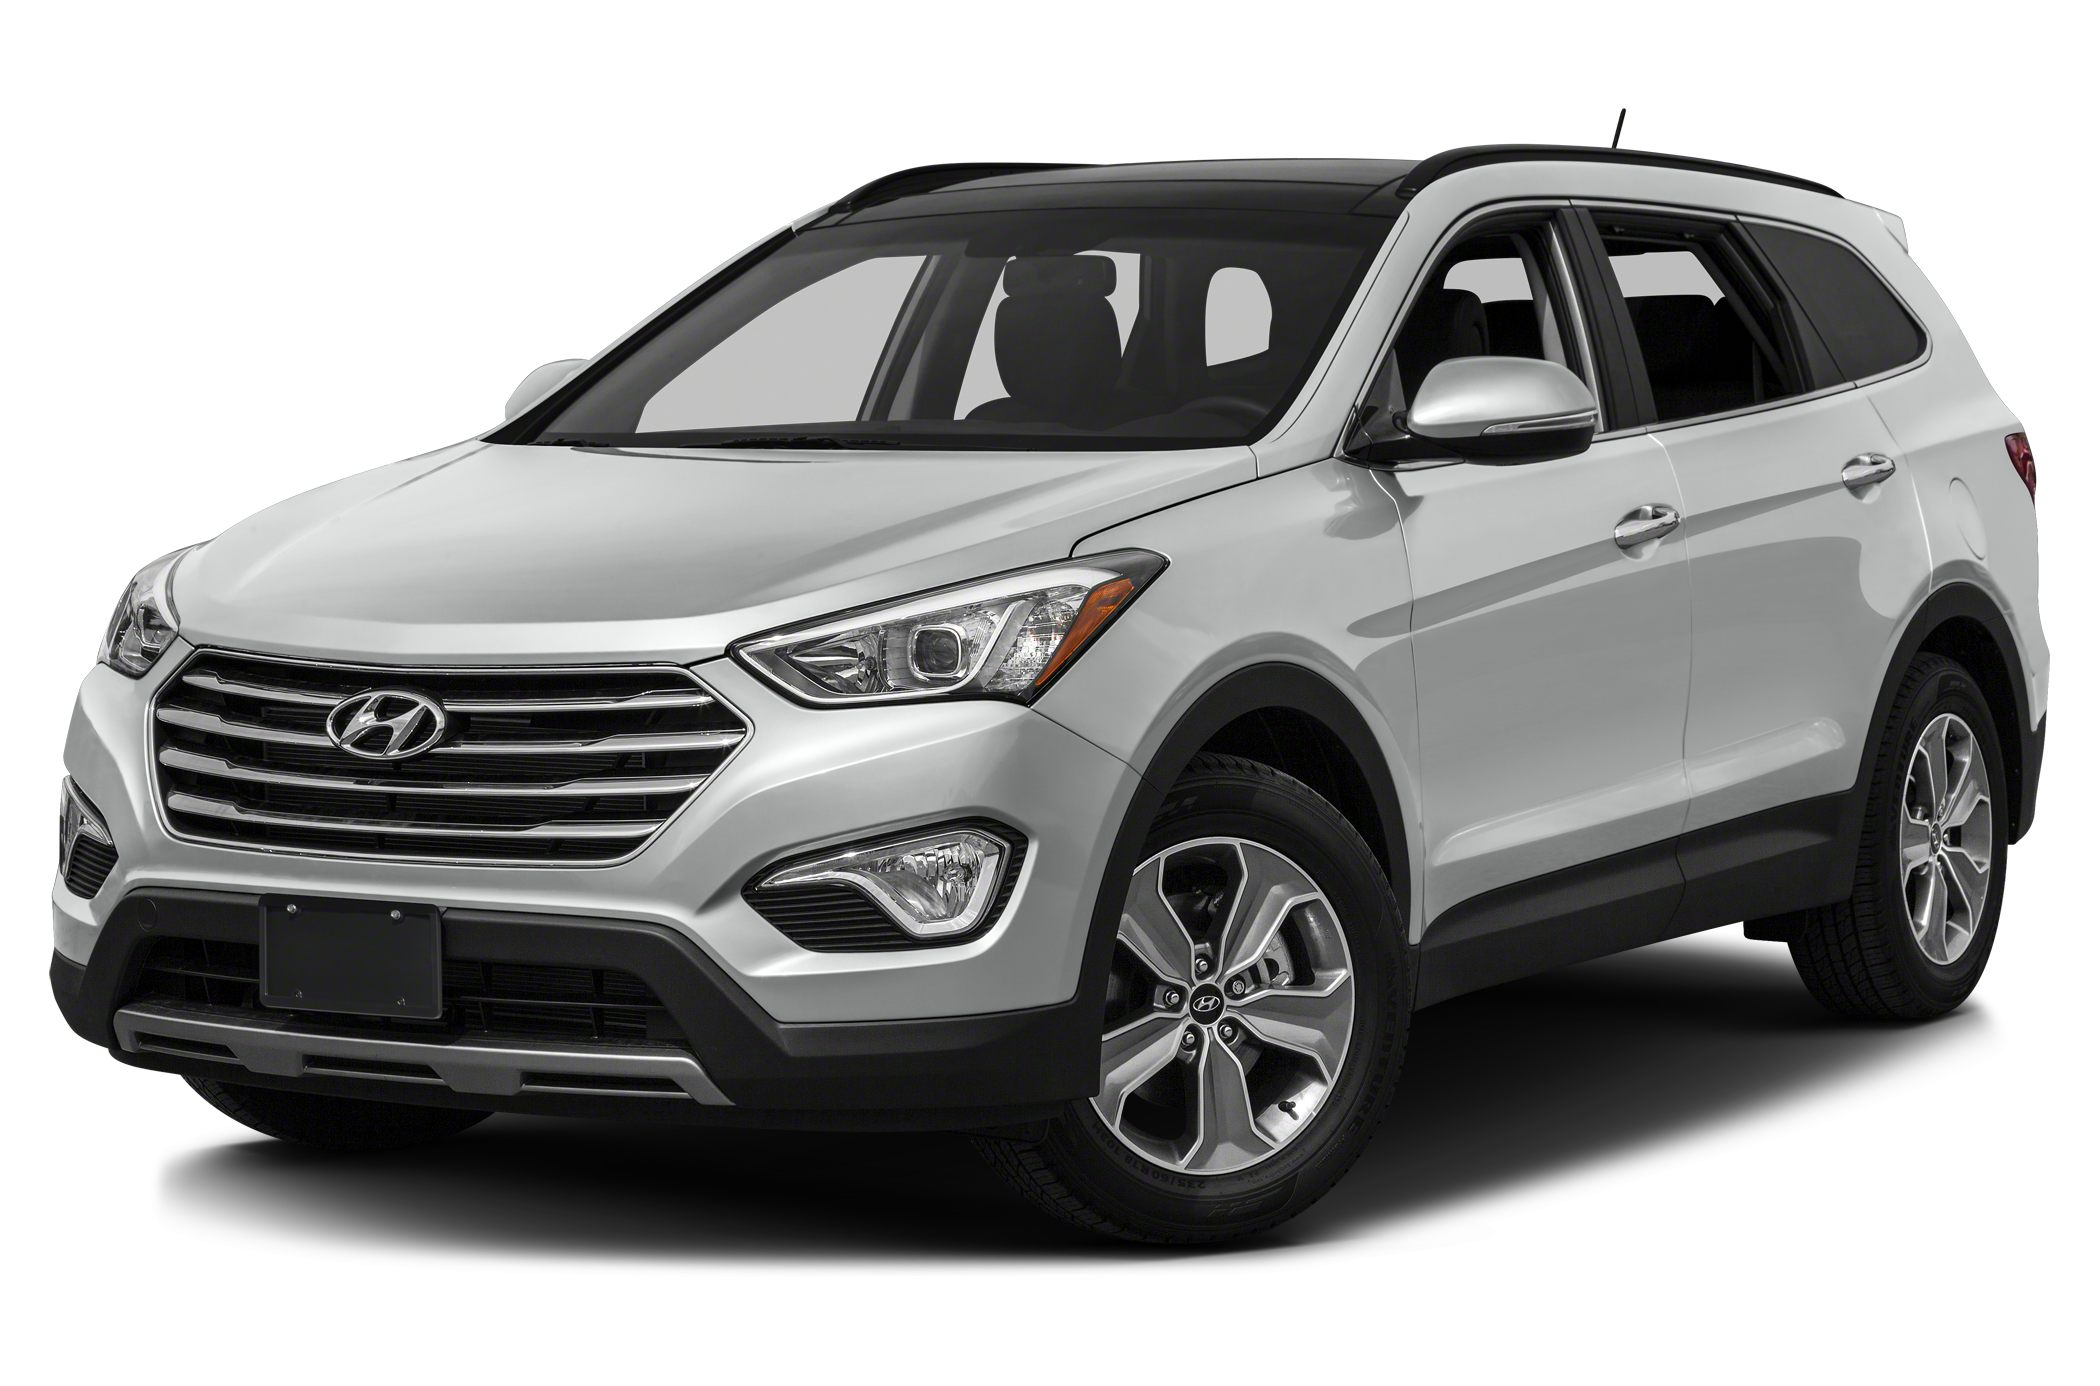 review autoblog sante santa fd hyundai first limited fe drive